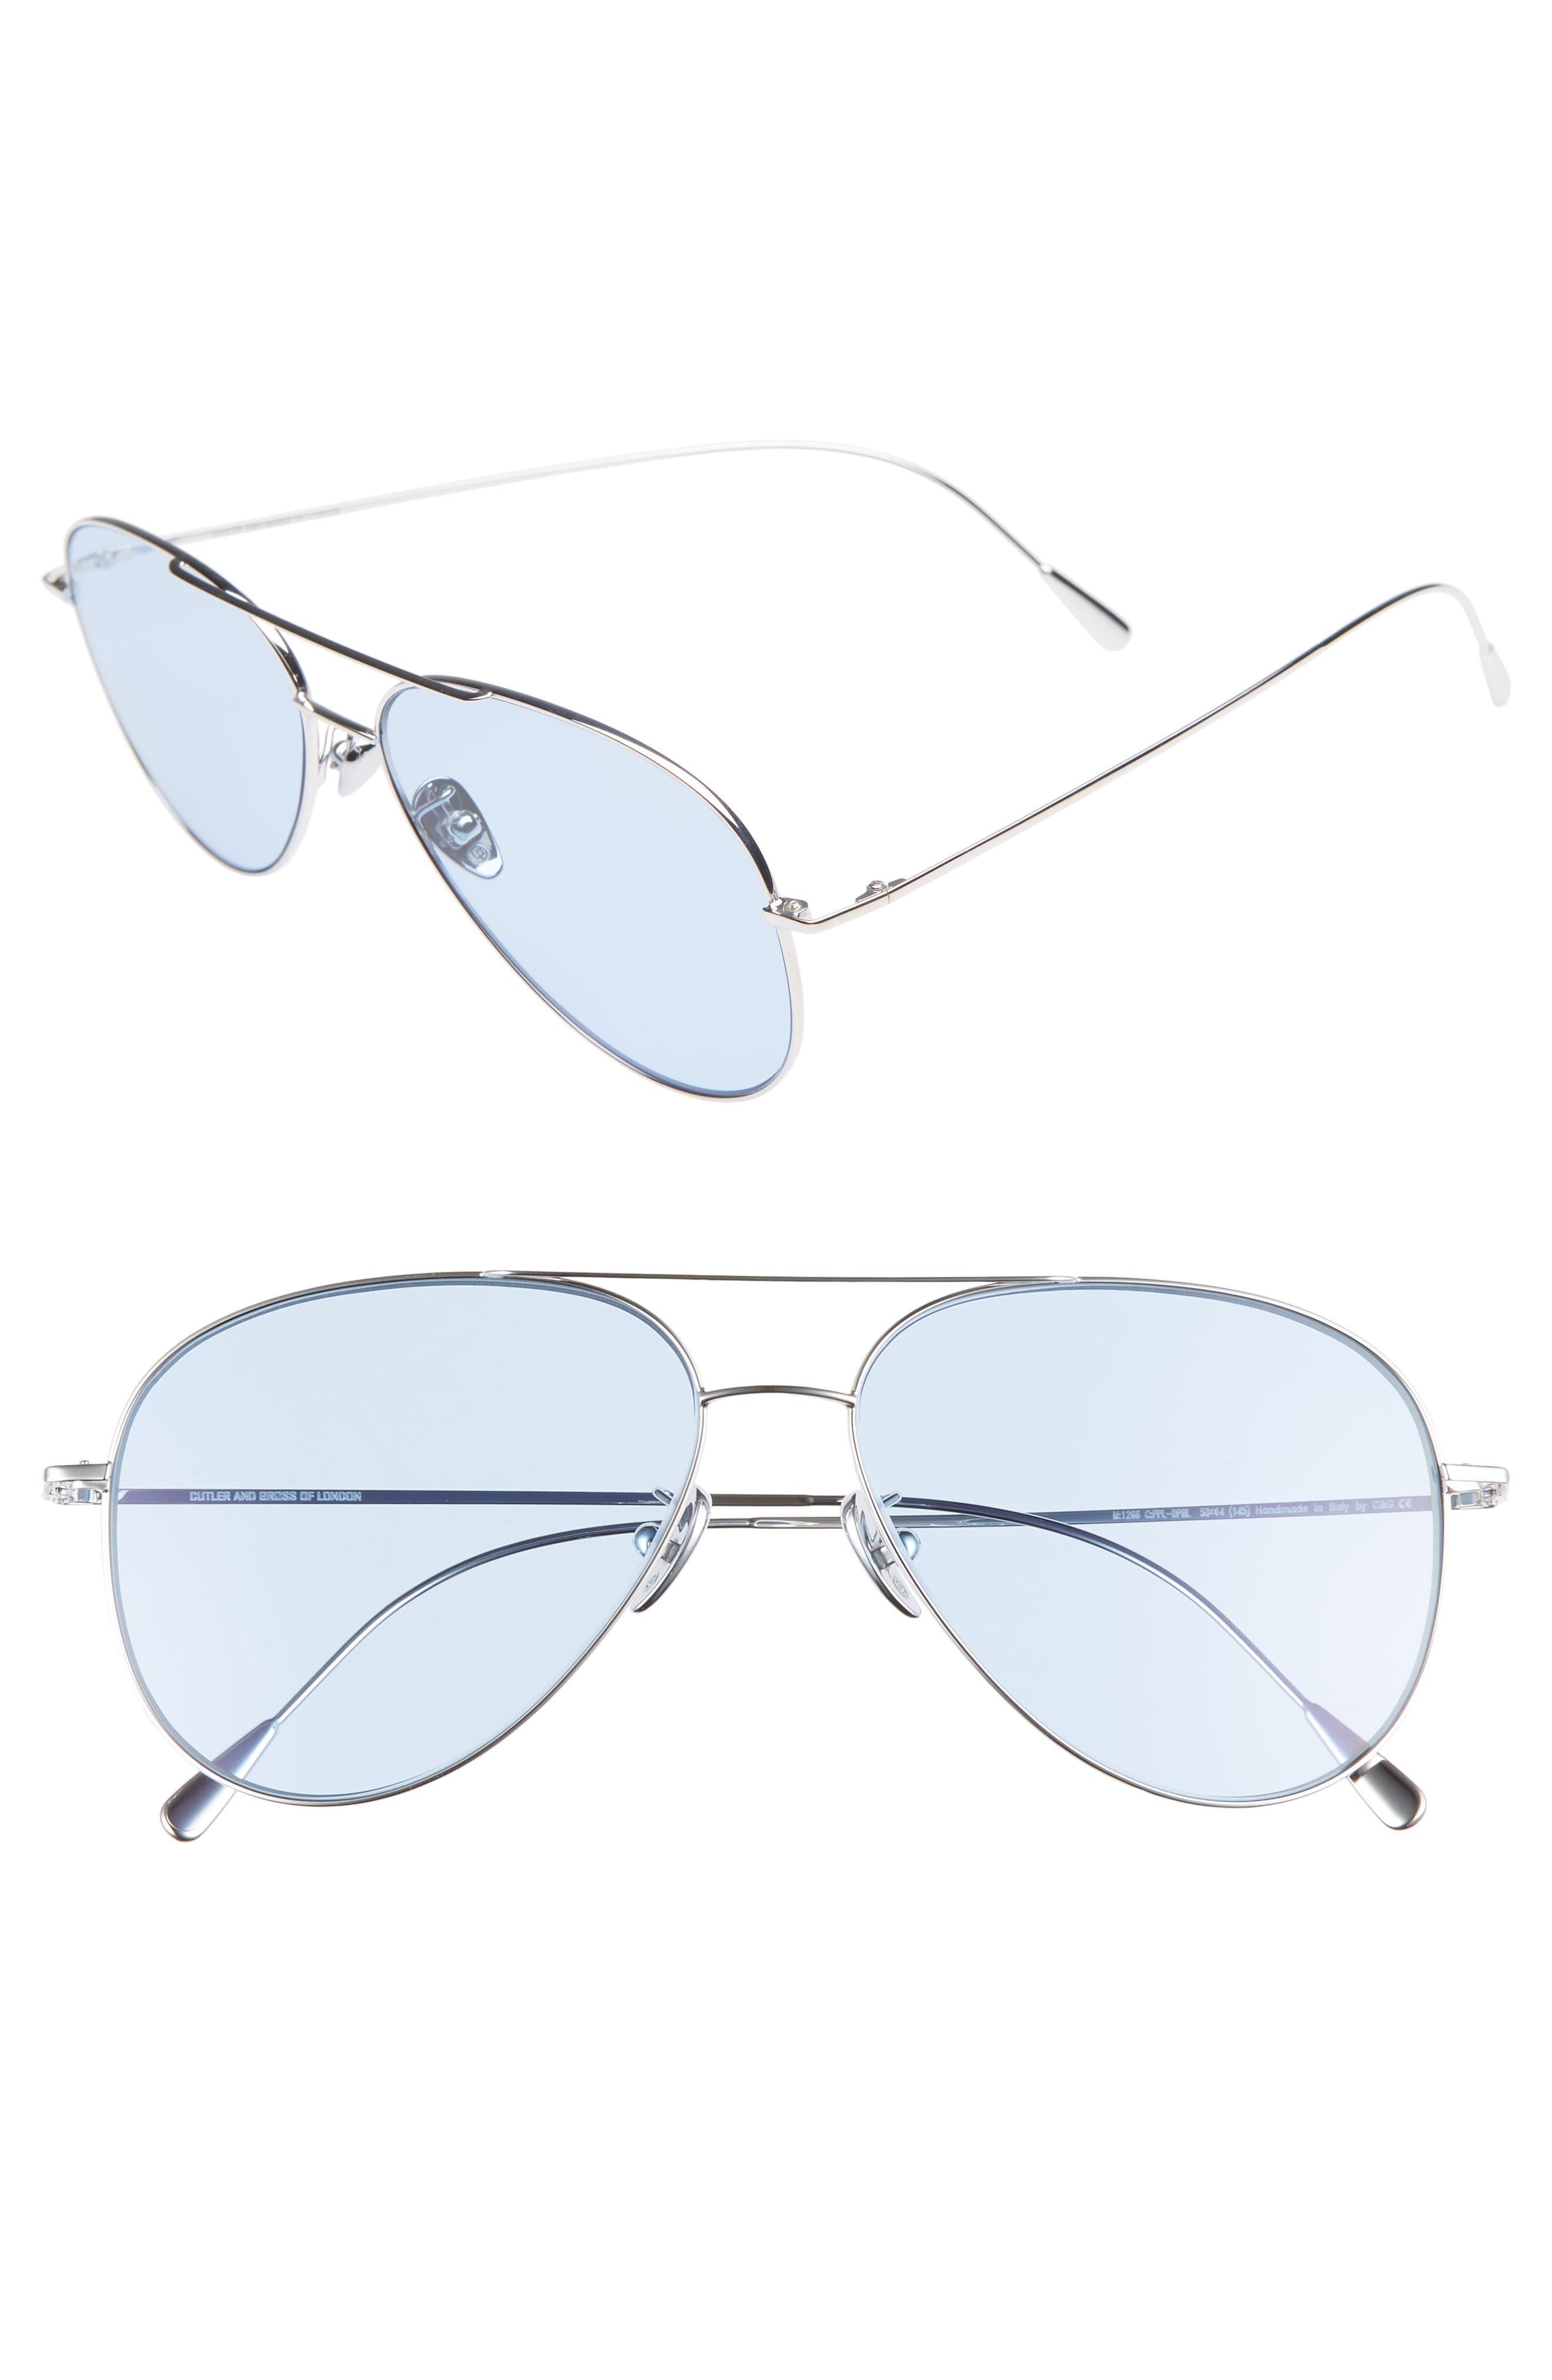 58mm Polarized Aviator Sunglasses,                         Main,                         color, PALLADIUM/ BLUE